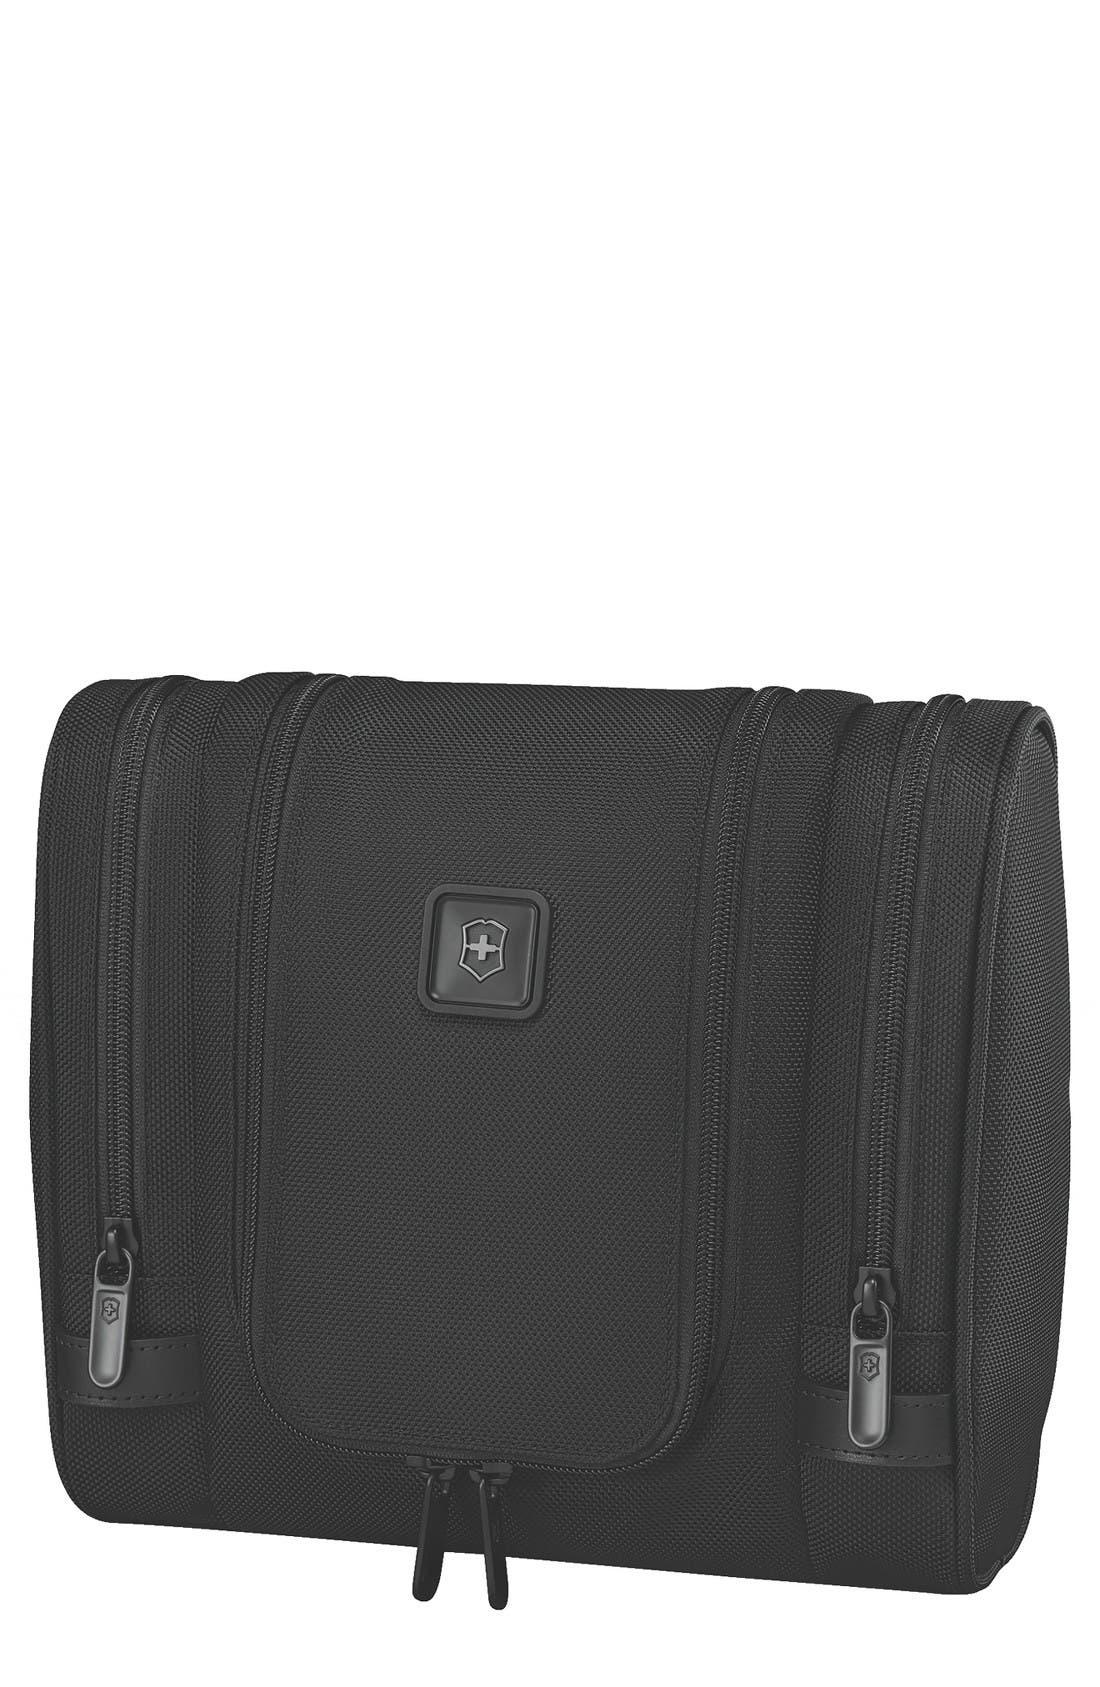 Victorinox Swiss Army® Lexicon 2.0 Hanging Travel Kit